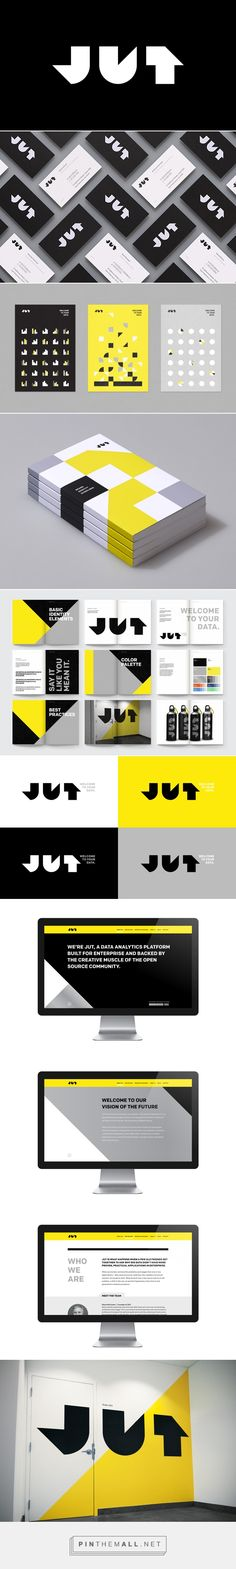 Jut – Visual Identity System by Moniker SF                                                                                                                                                                                 Plus